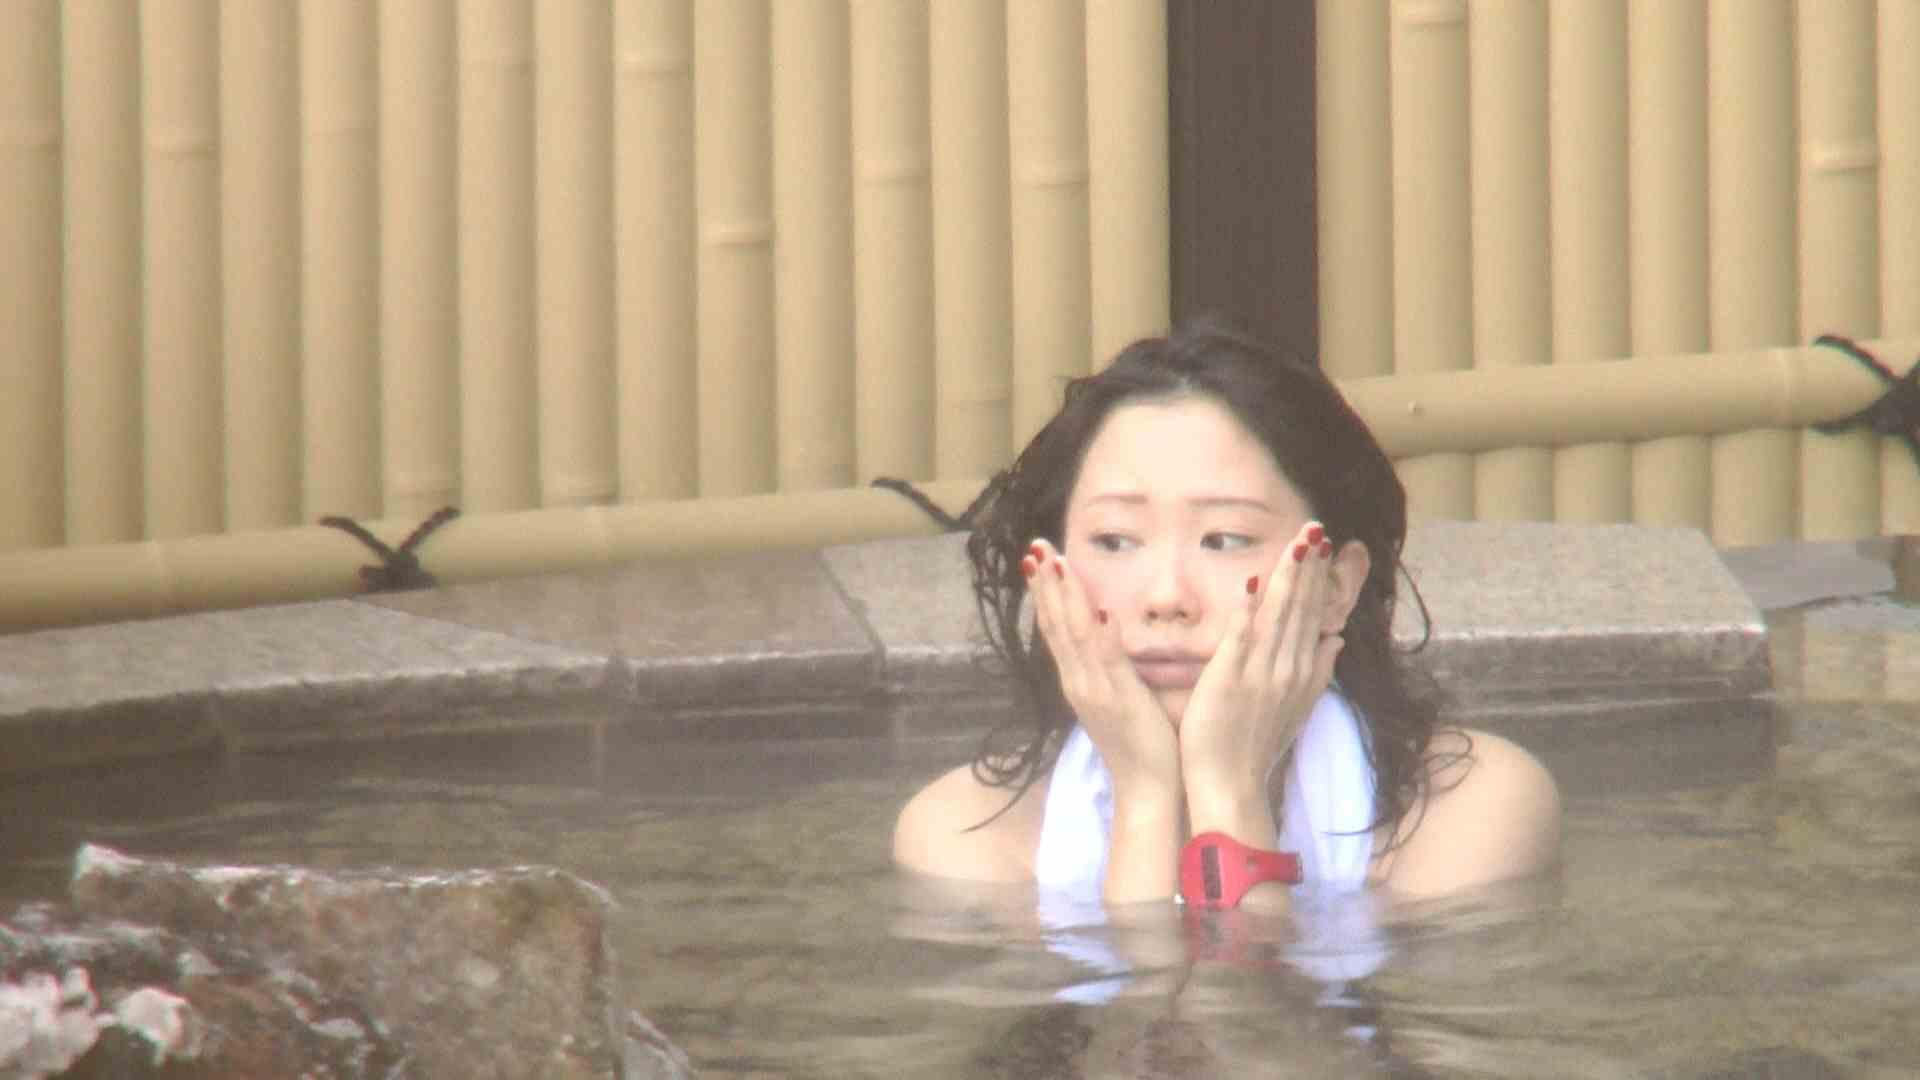 Aquaな露天風呂Vol.211 HなOL   盗撮  76pic 1